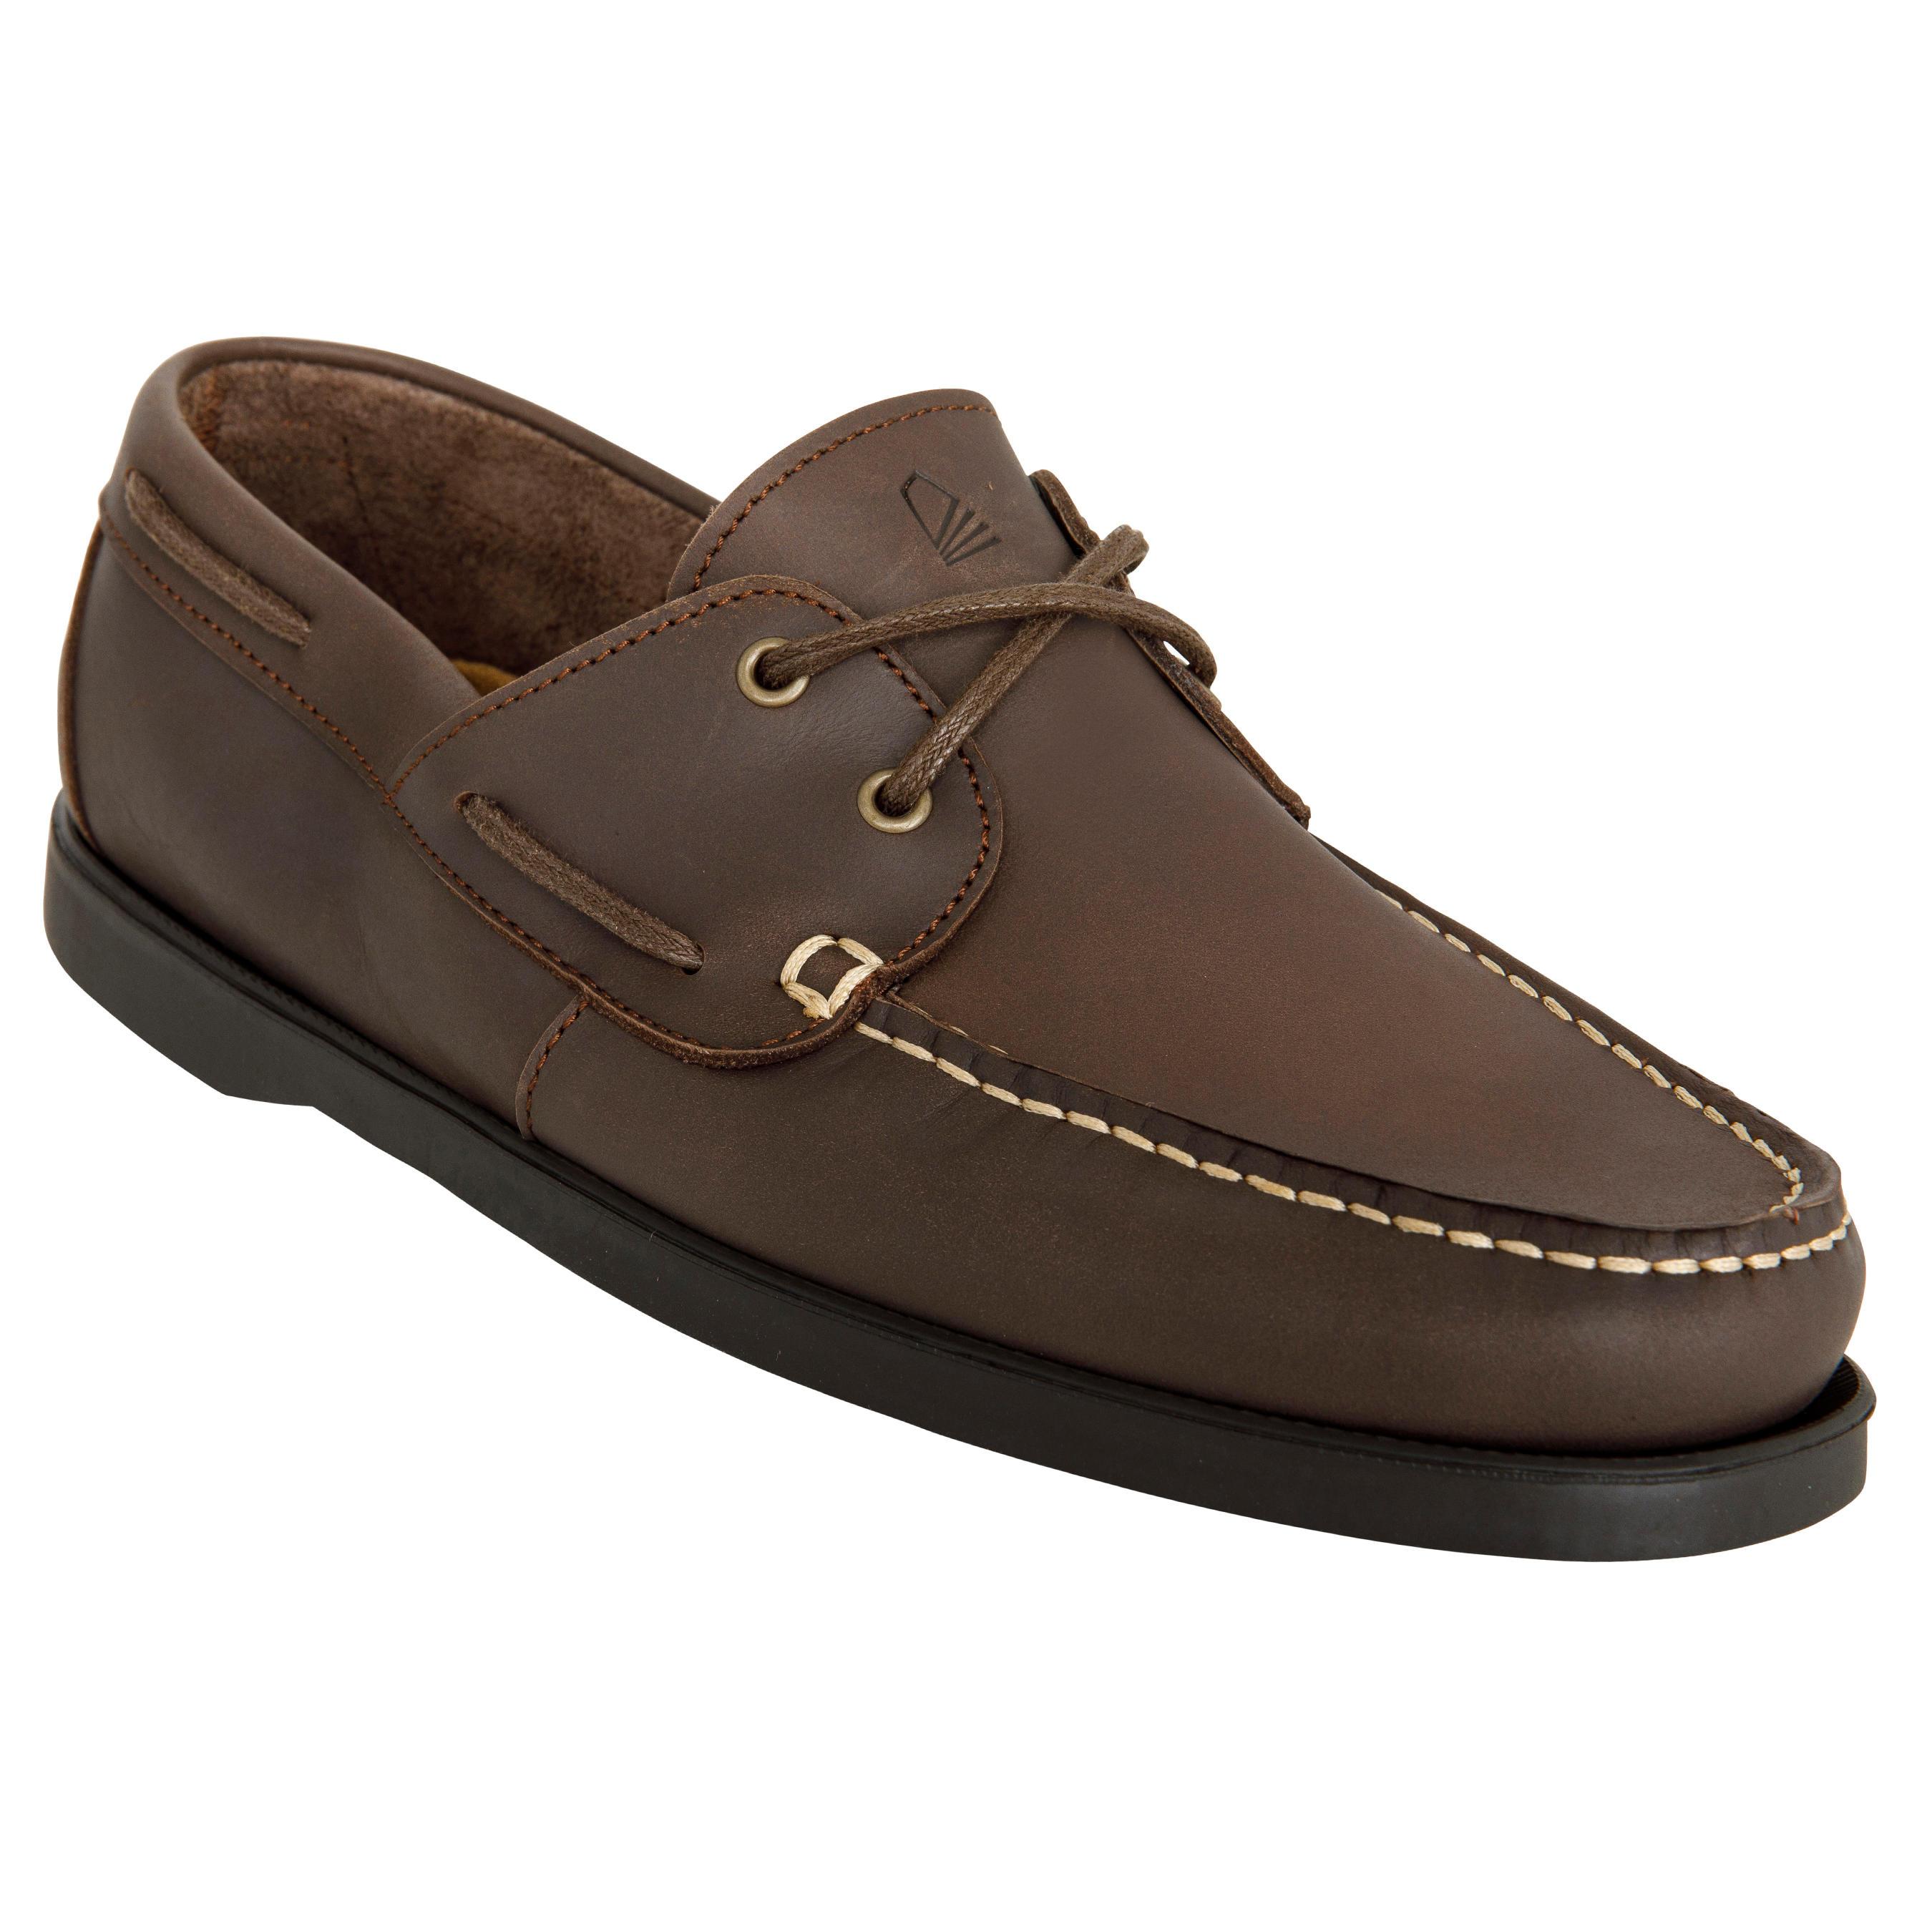 a4f7d2618 Comprar Zapatos Náuticos de hombre online